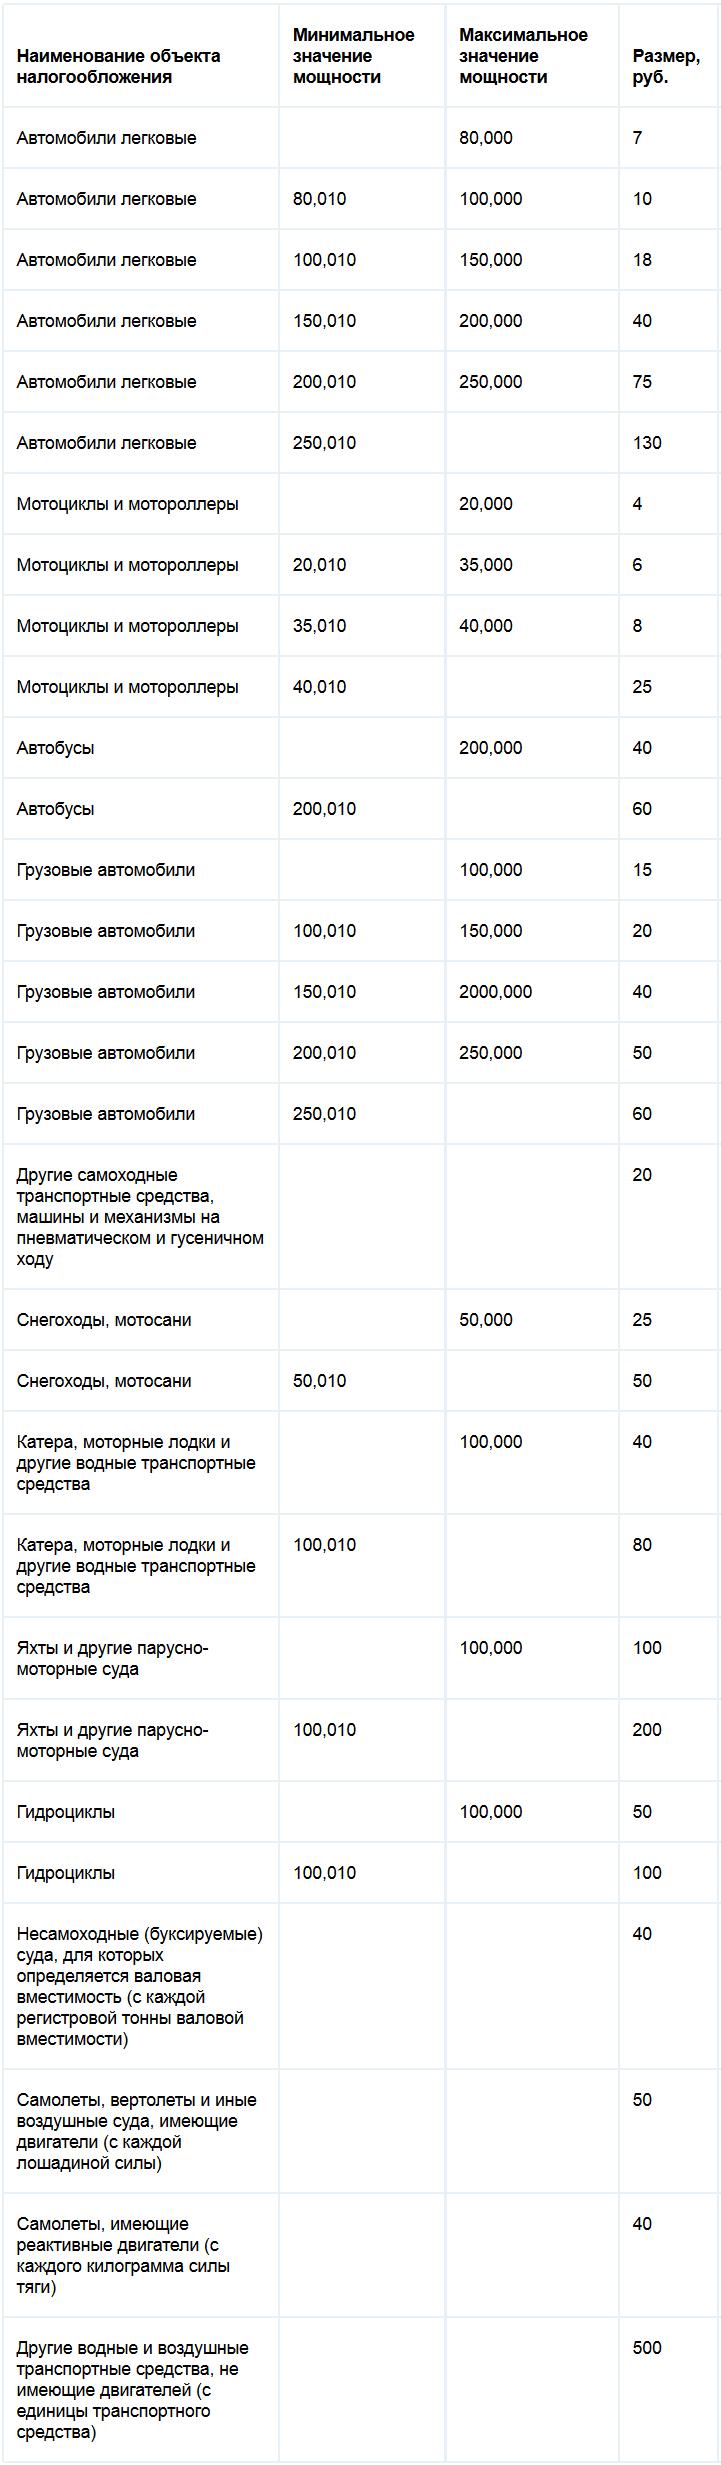 Ставки транспортного налога Брянской области